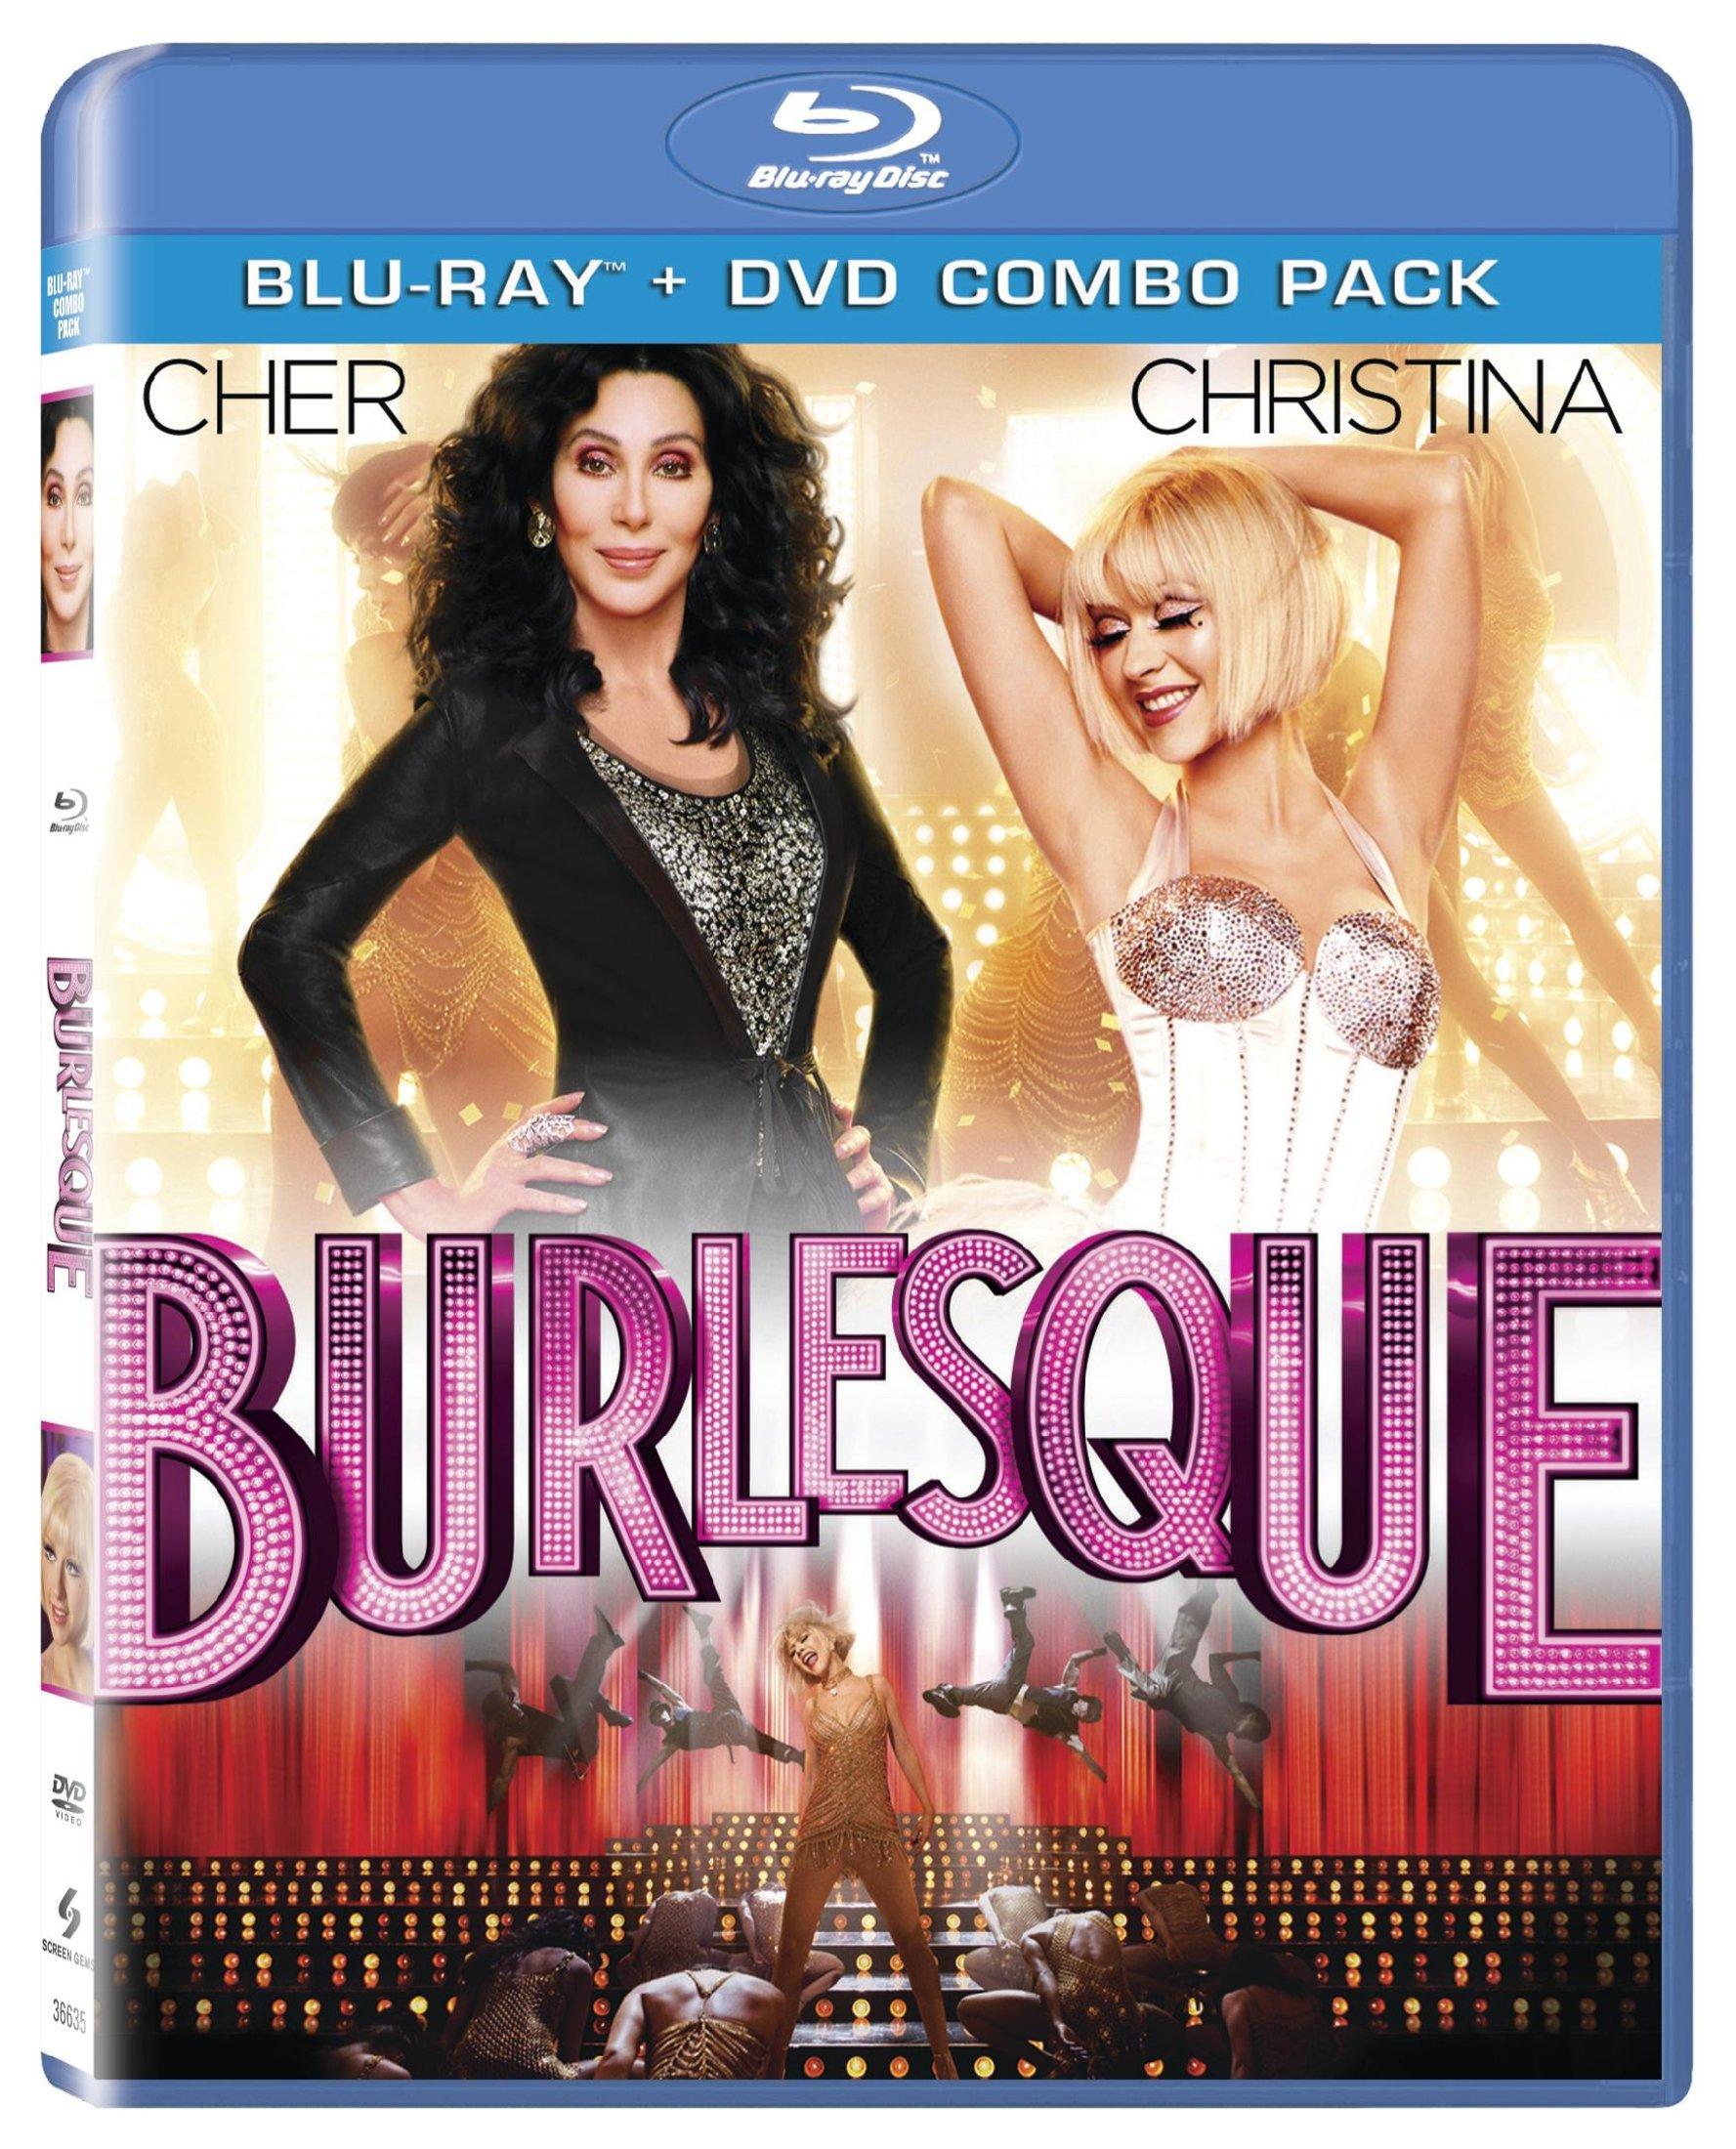 Burlesque - film 2010 - AlloCiné